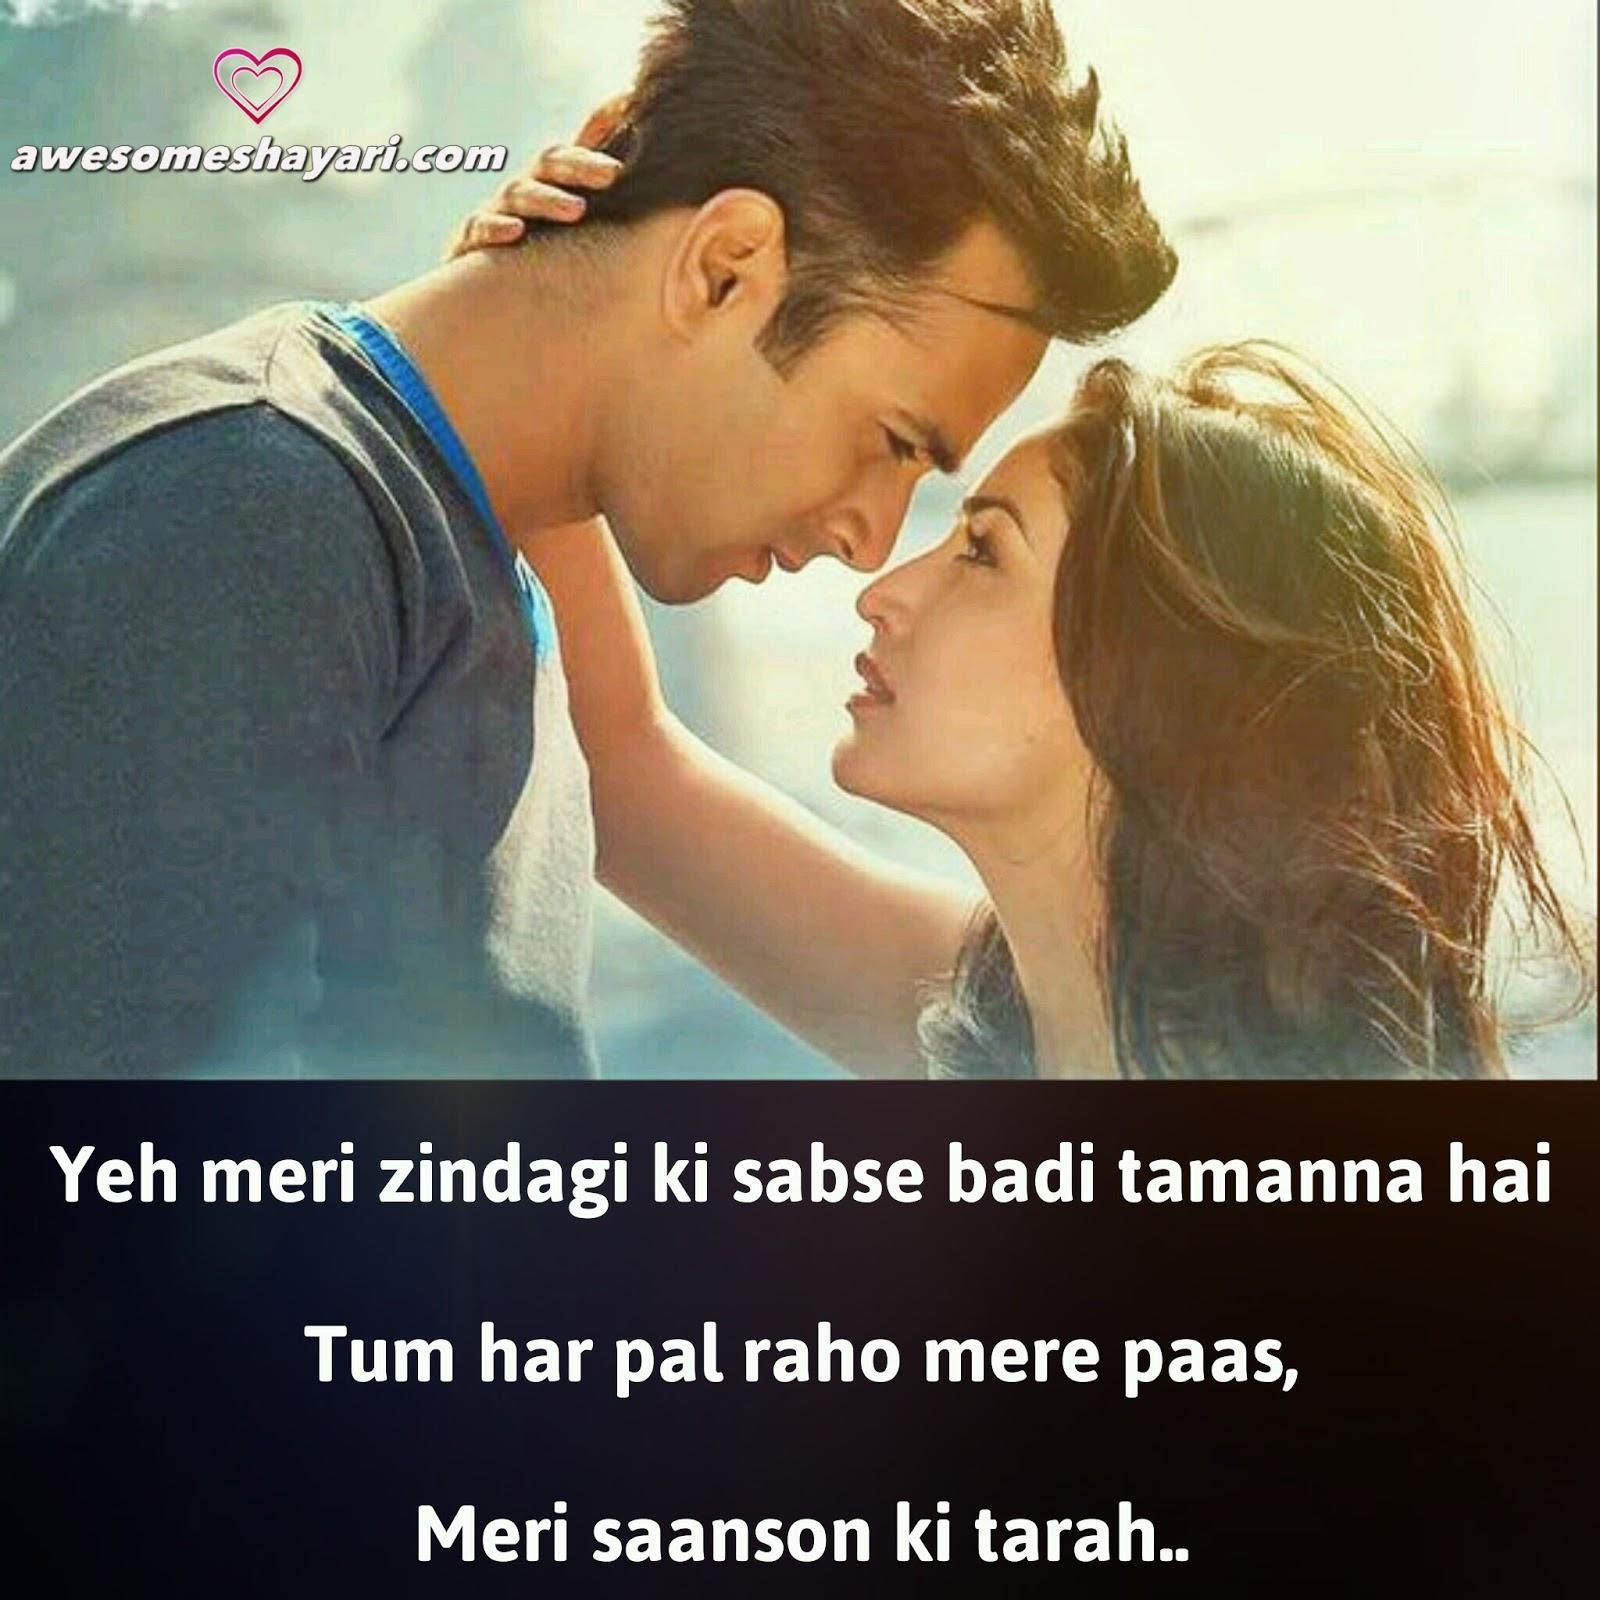 Love Shayari New Romantic ShayariQuotes For Facebook